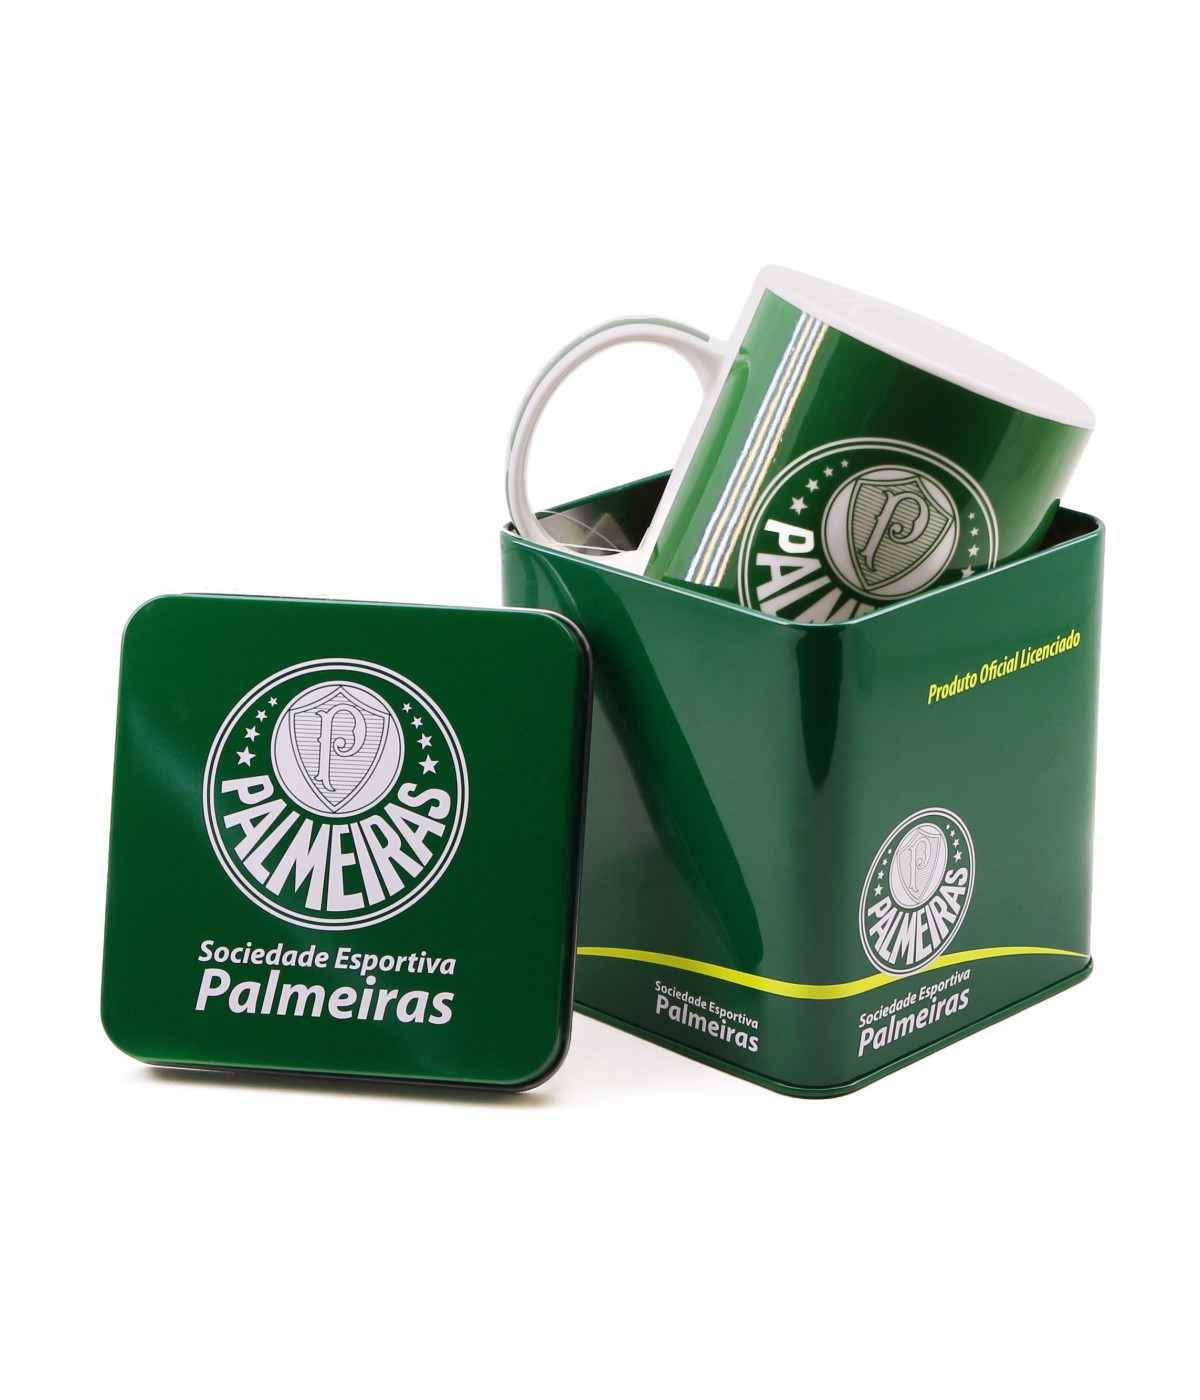 32e25a98a4975 CANECA DE PORCELANA NA LATA 320ML - PALMEIRAS ...